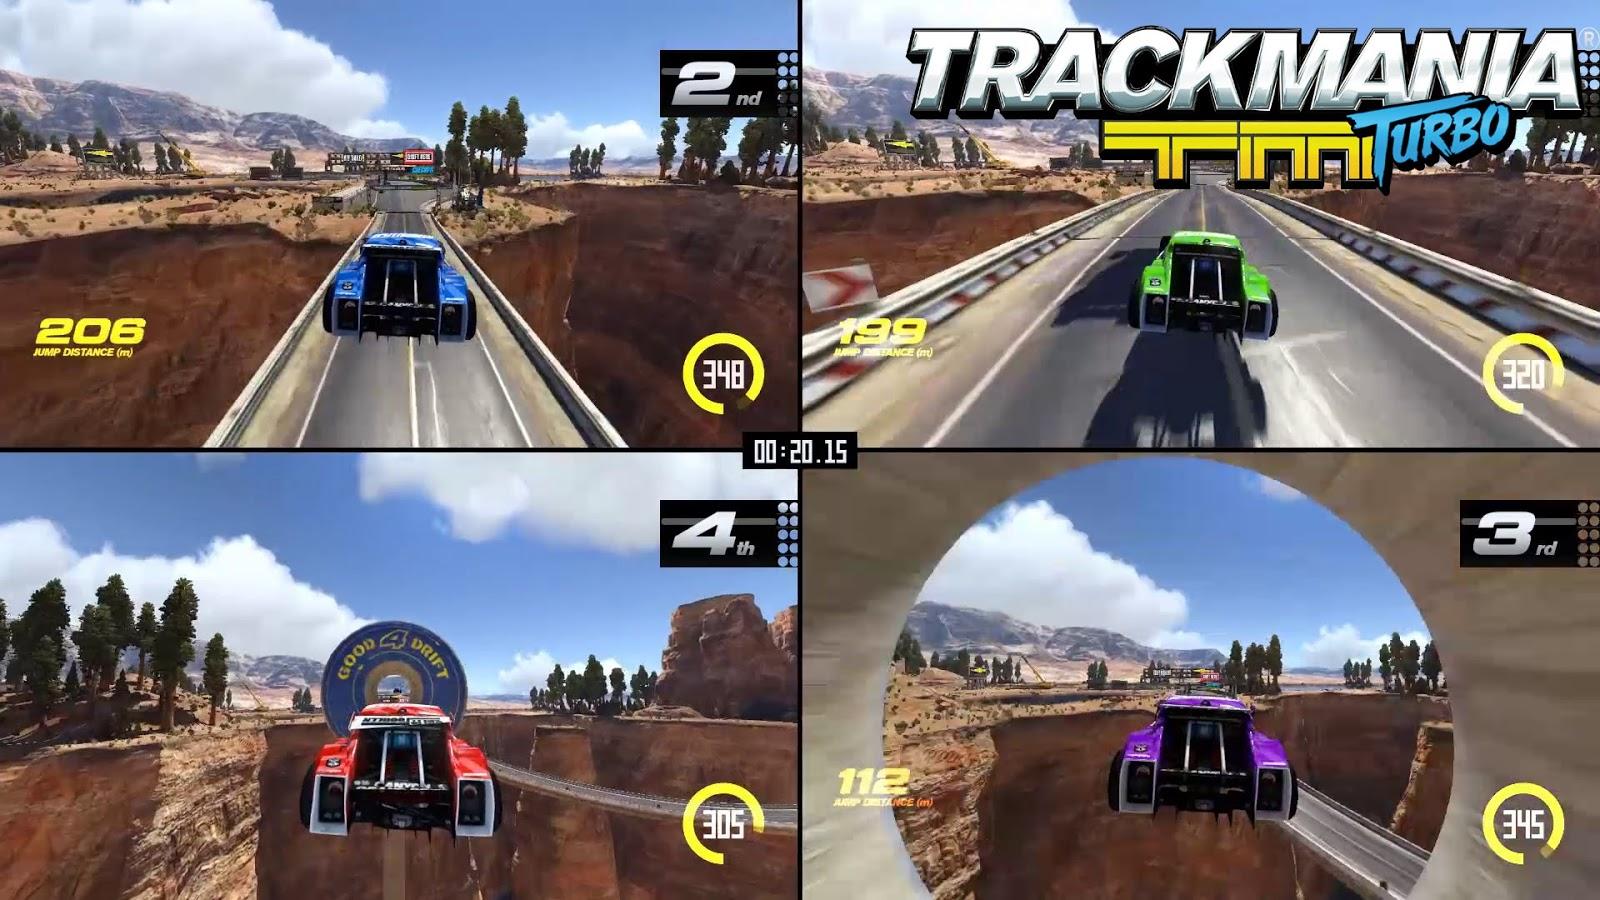 Download Trackmania Turbo-CODEX Terbaru 2016 - TC Blog